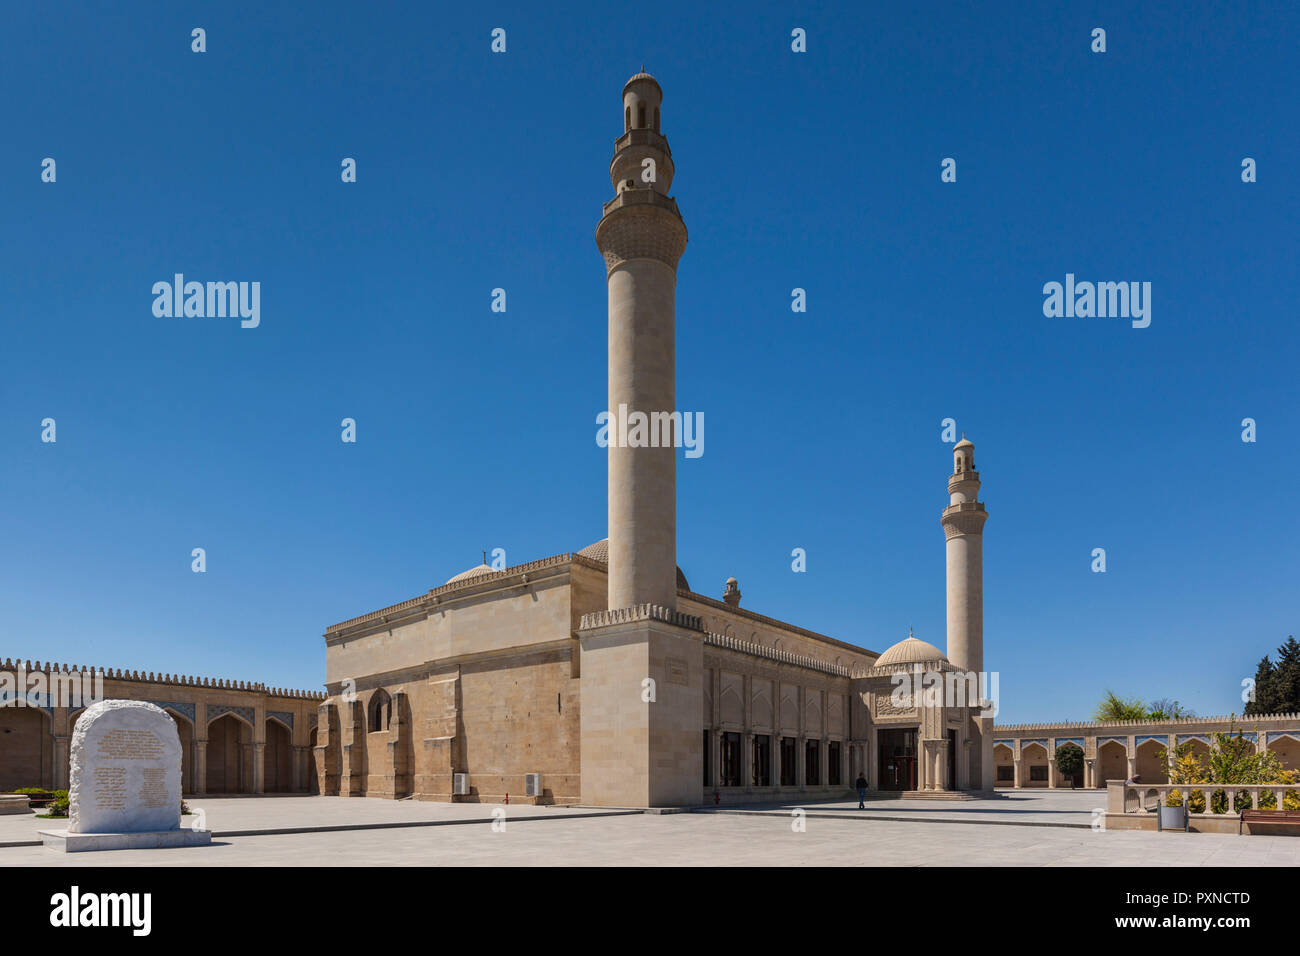 Azerbaijan, Samaxi, Juma Mosque or Friday Mosque - Stock Image